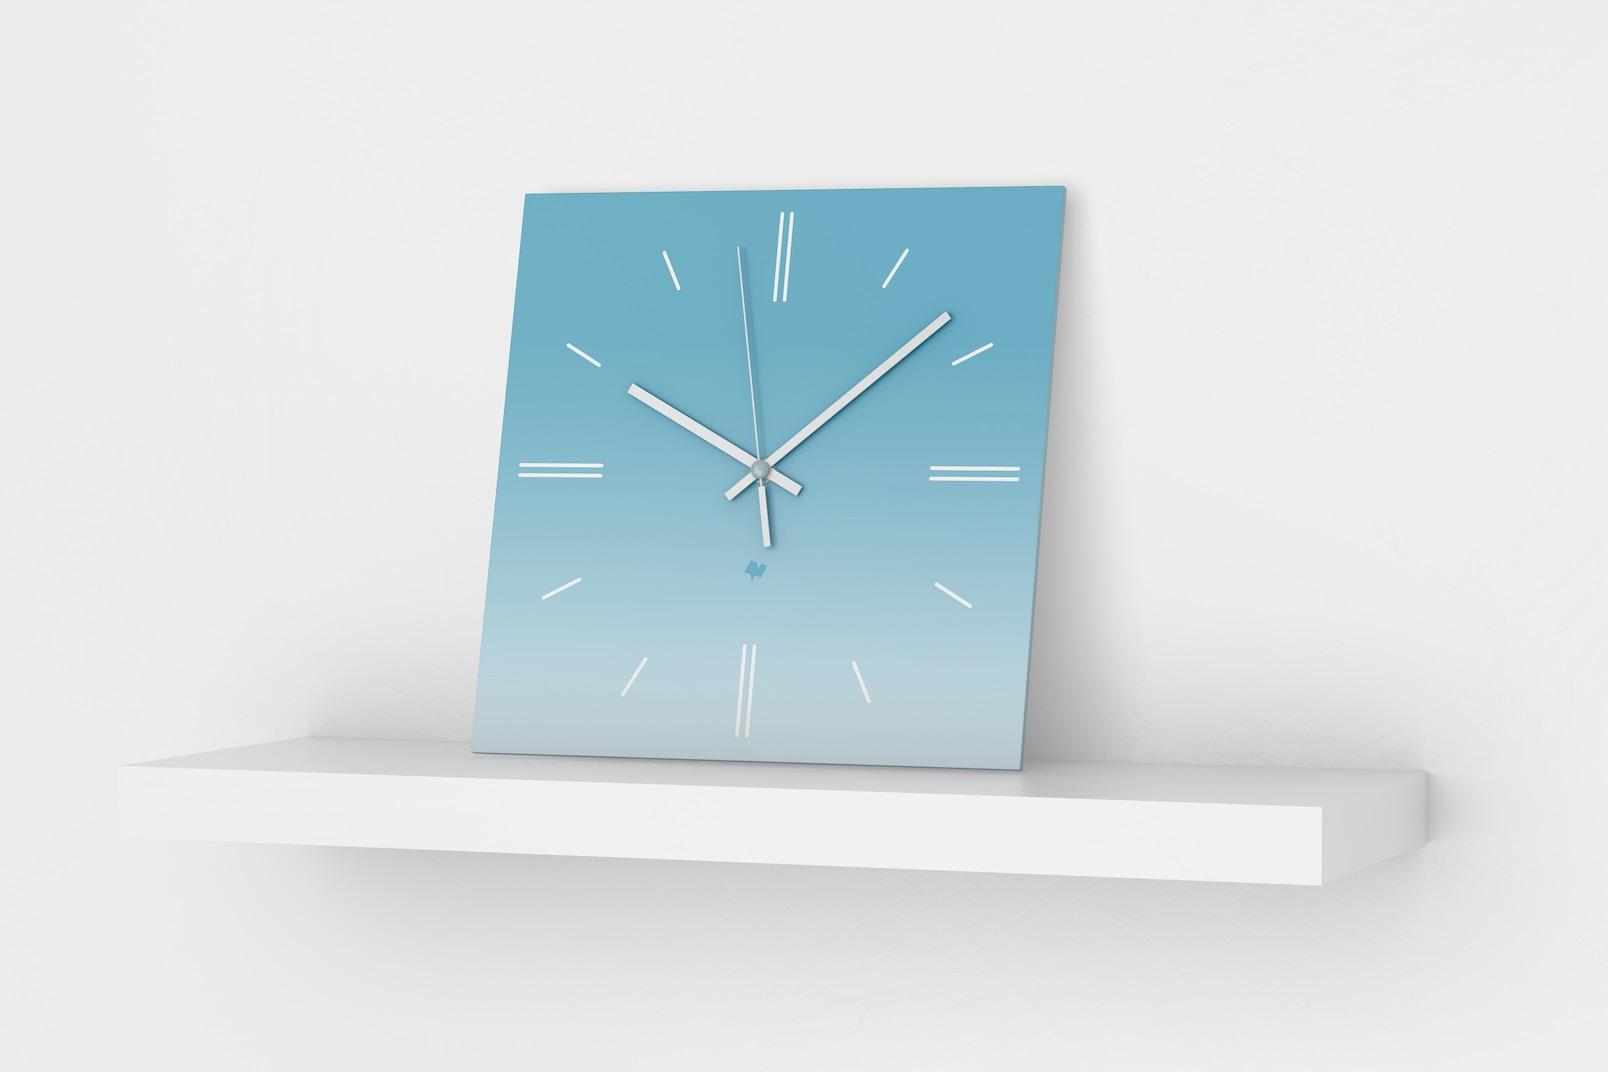 Square Wall Clock Mockup, Perspective